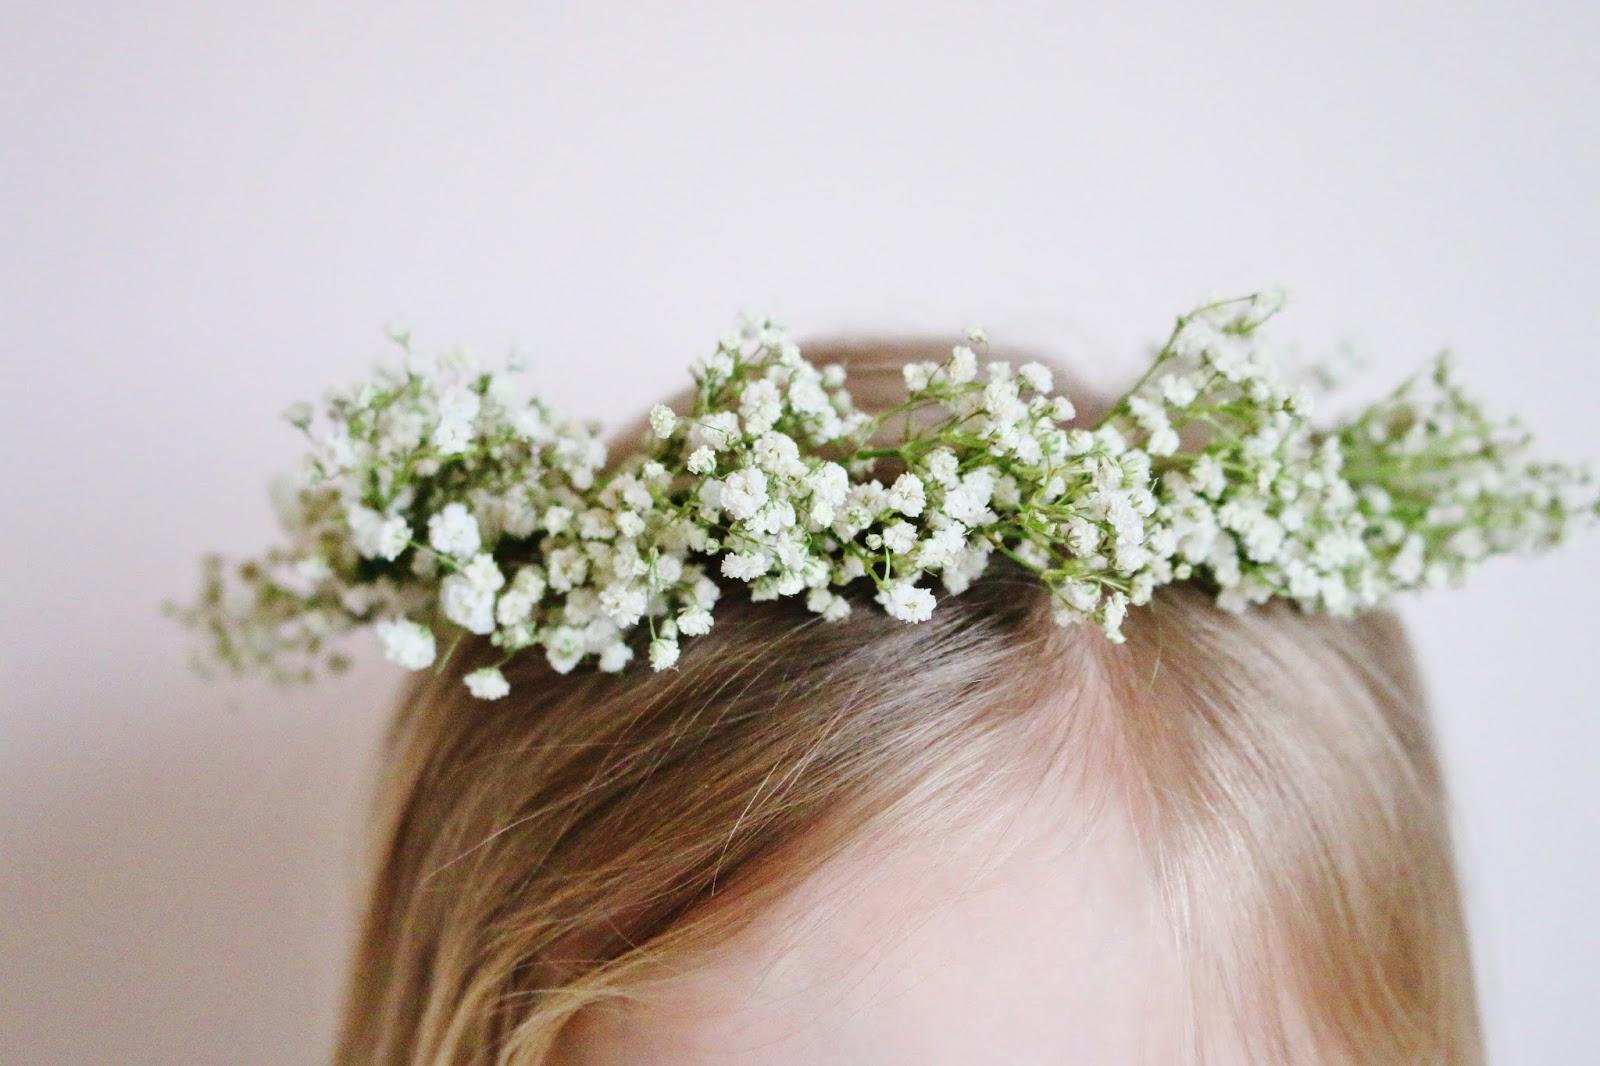 My Simple Modest Chic: DIY Baby's Breath Flower Crown Tutorial